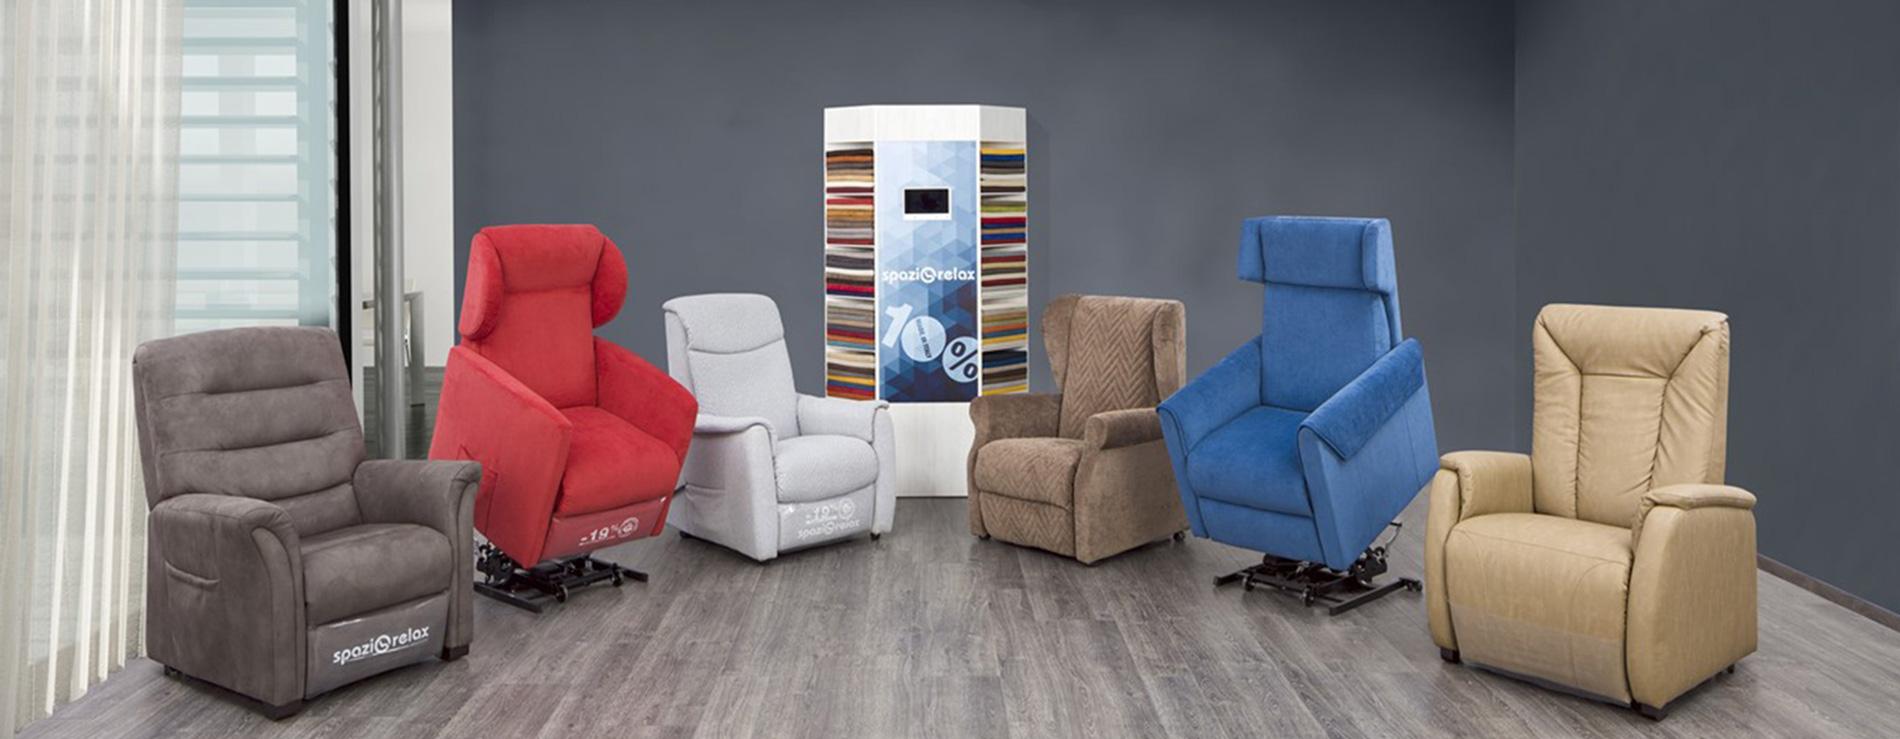 Poltrone Relax Di Design.Poltrone Relax 100 Made In Italy